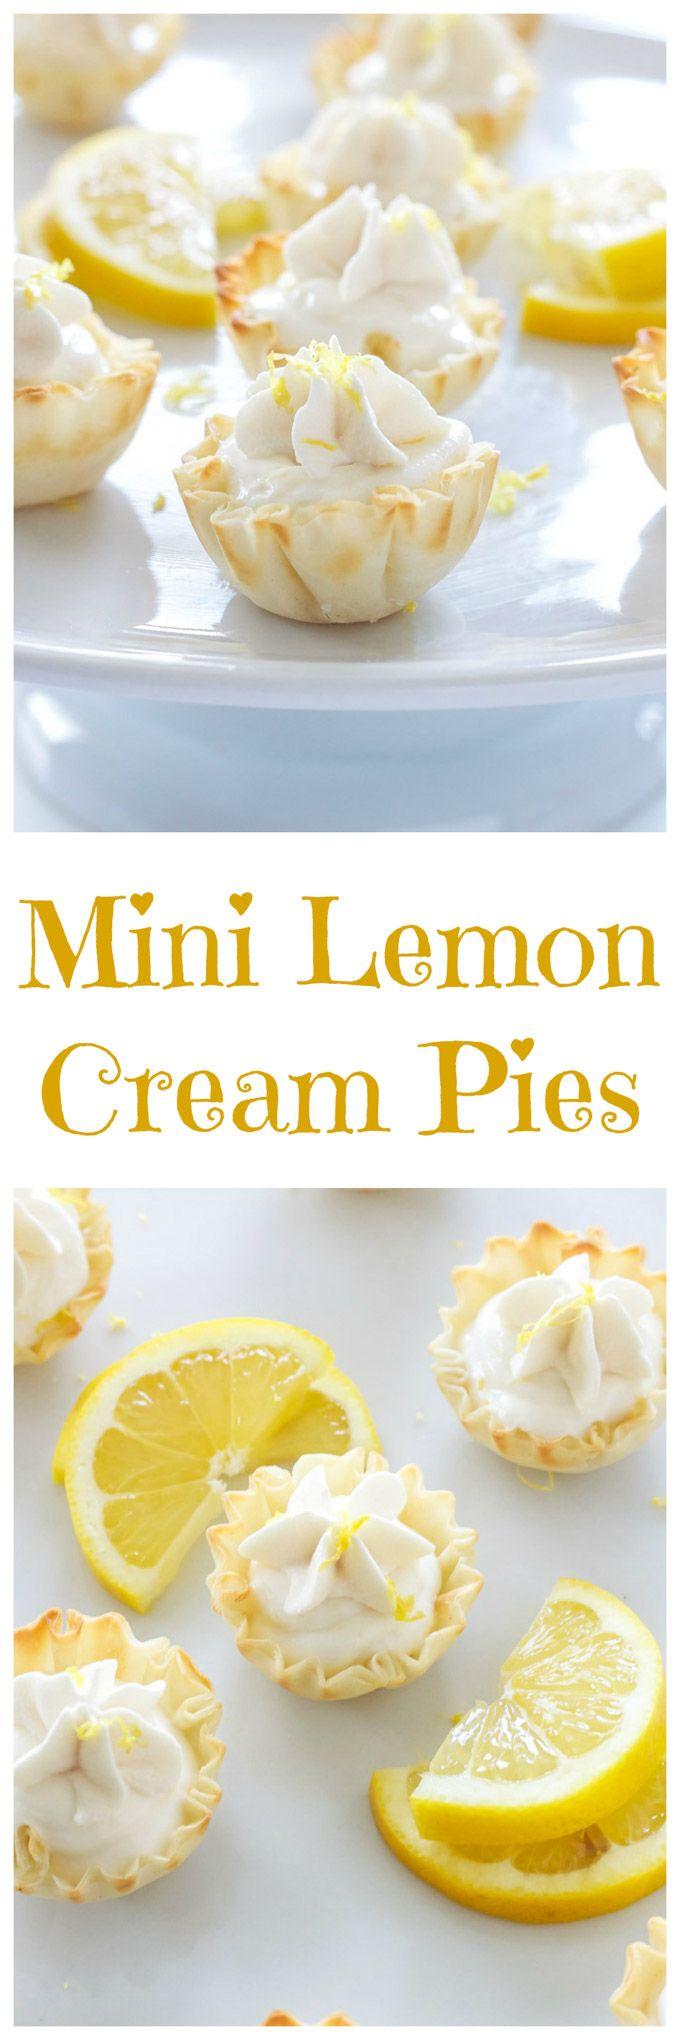 Mini Lemon Cream Pies | These one bite mini cream pies are a perfect sized dessert!